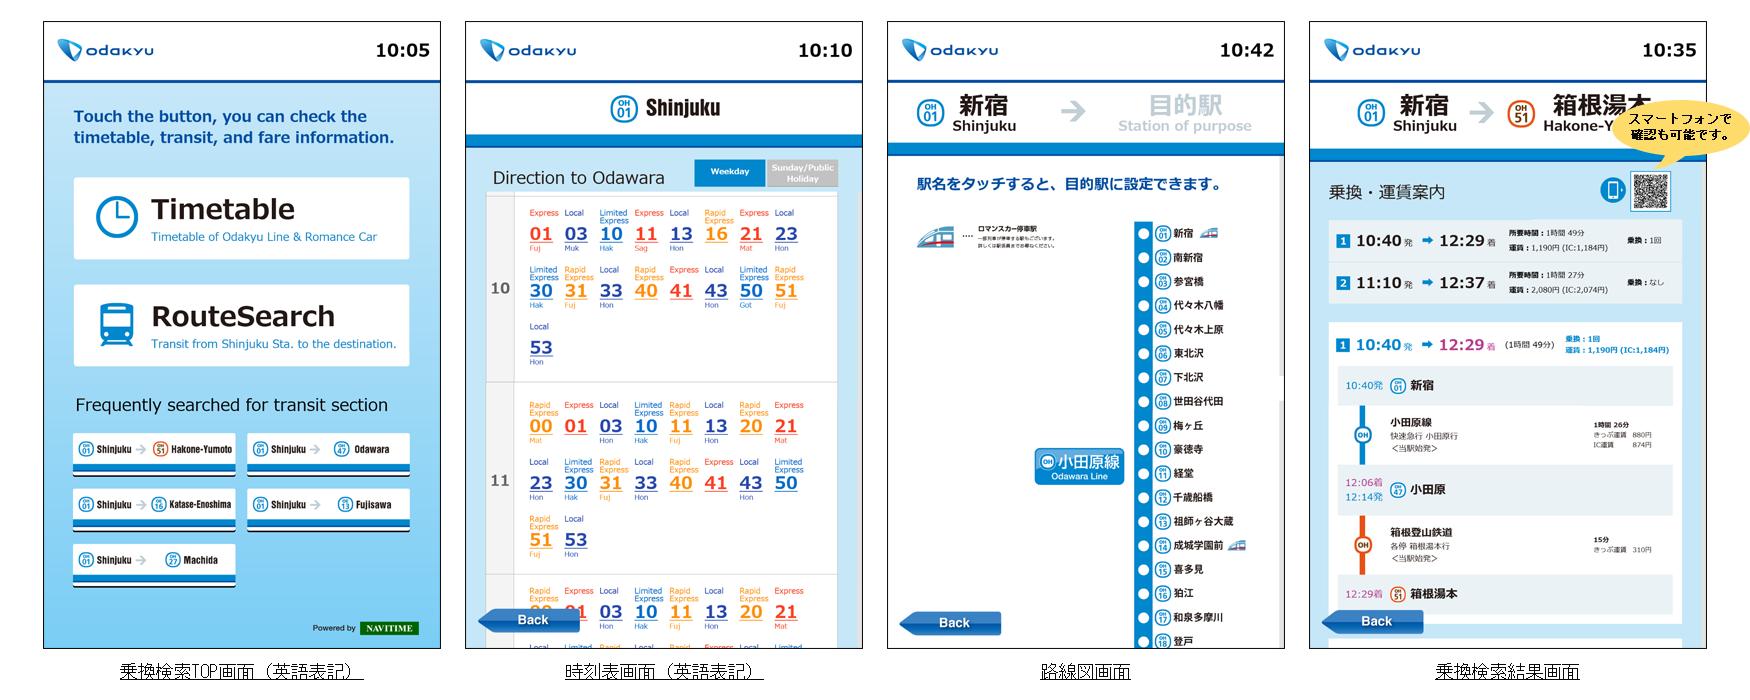 http://corporate.navitime.co.jp/topics/b8358aaa3ccfb5de4b7fa722ac6eeb45cb9797a5.png